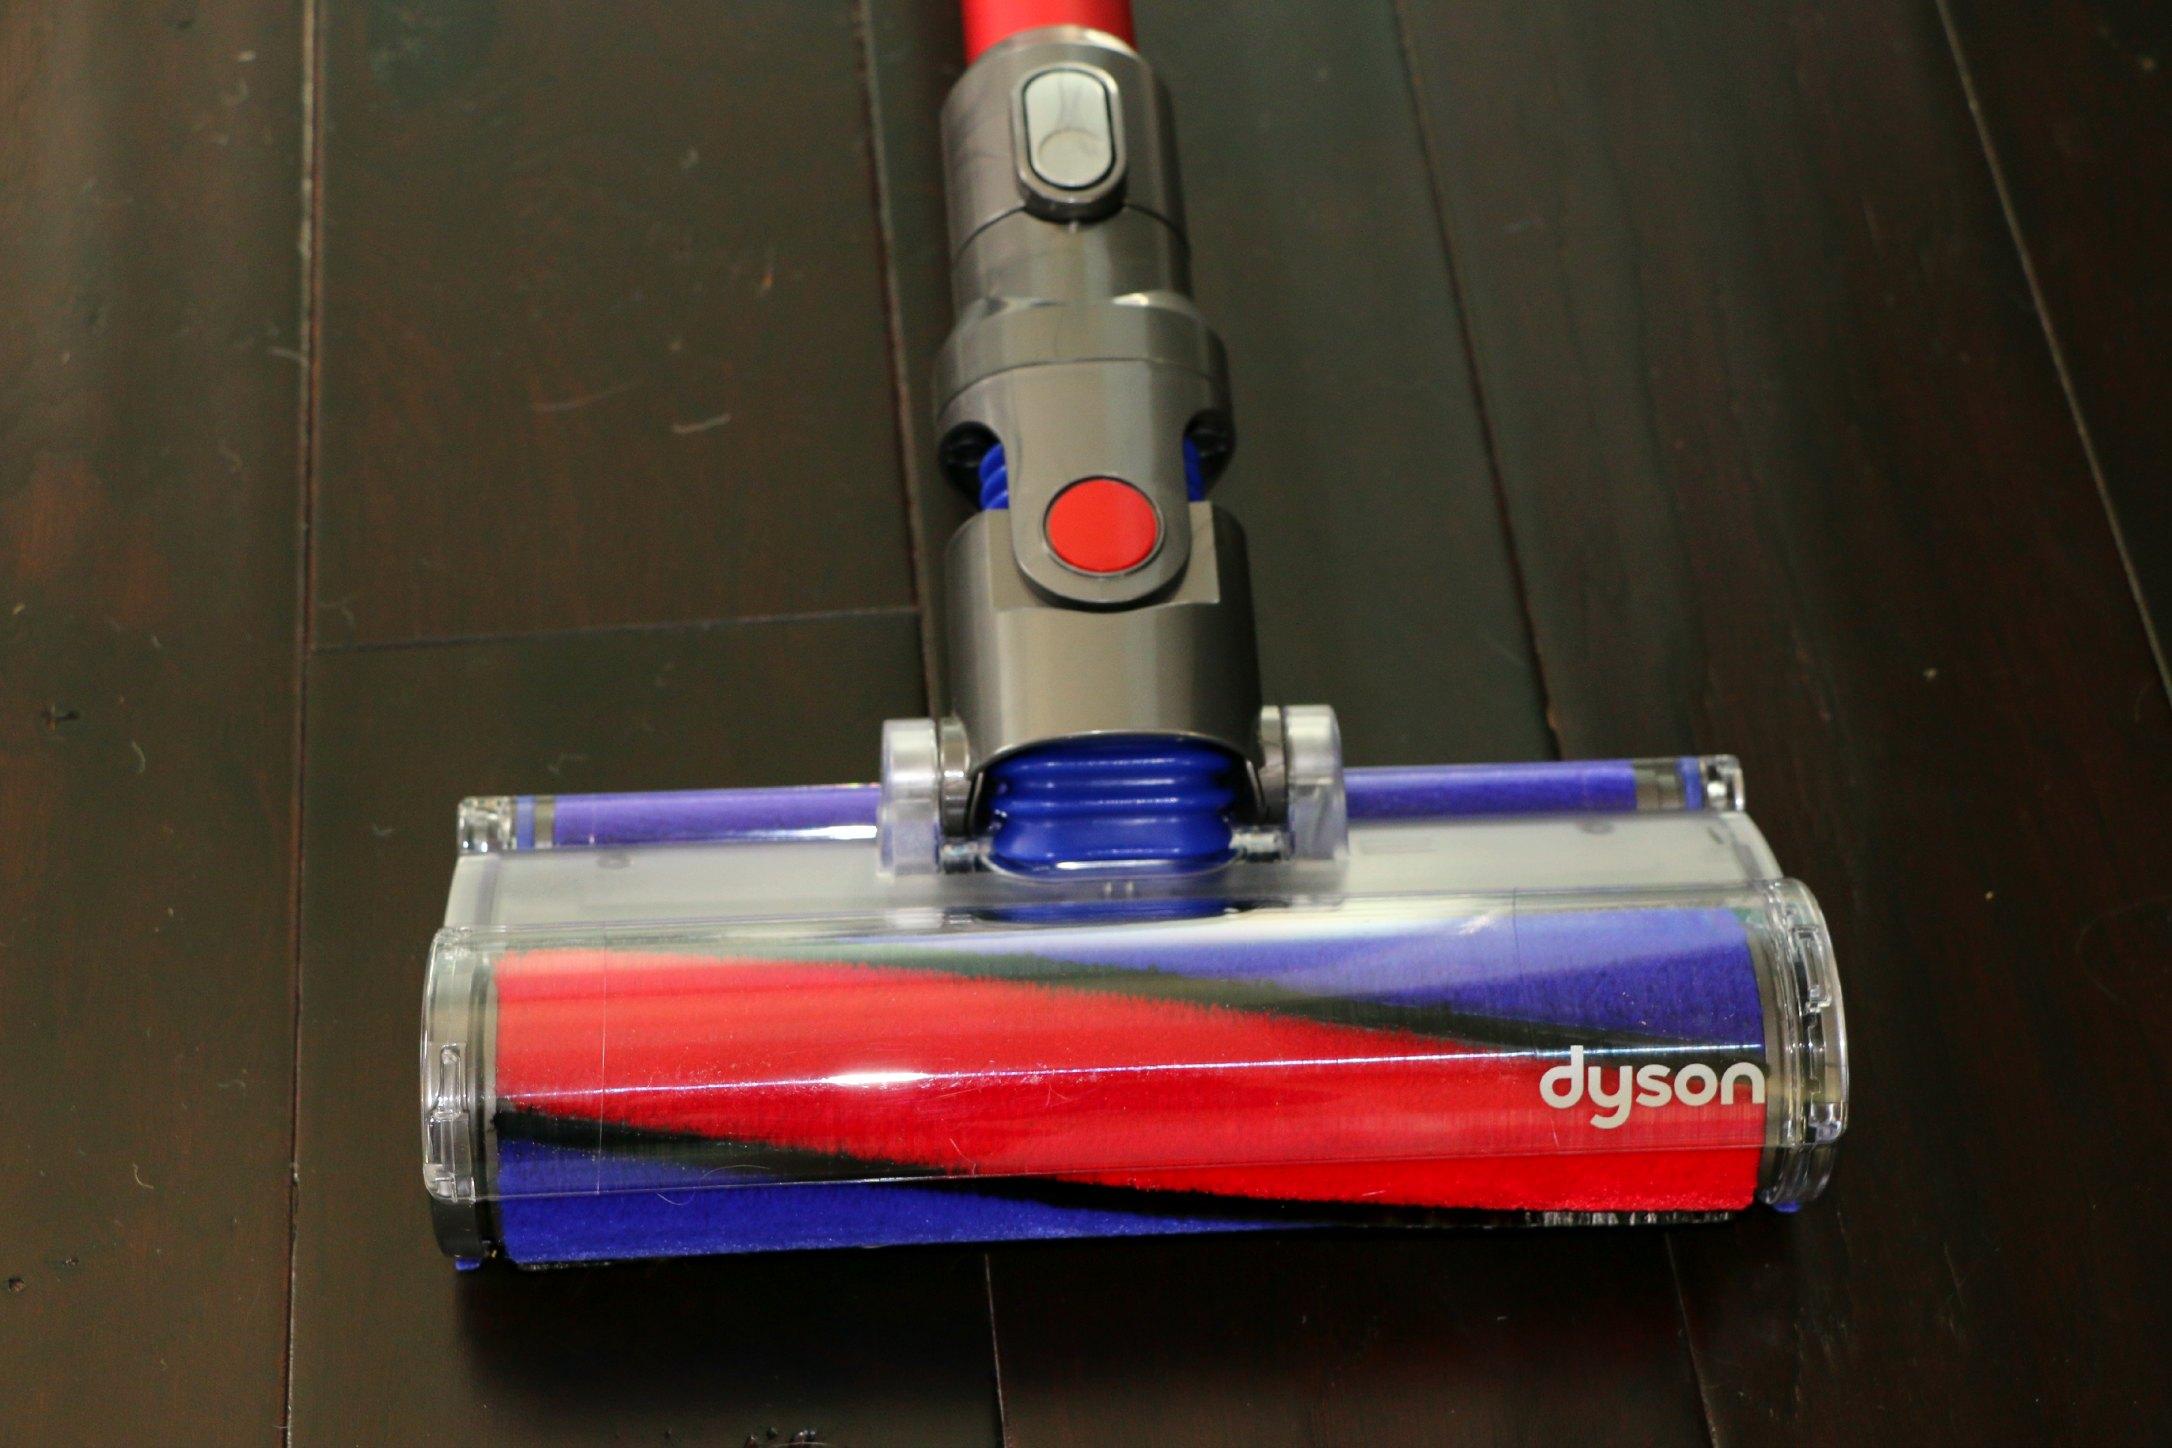 dyson stick vacuum